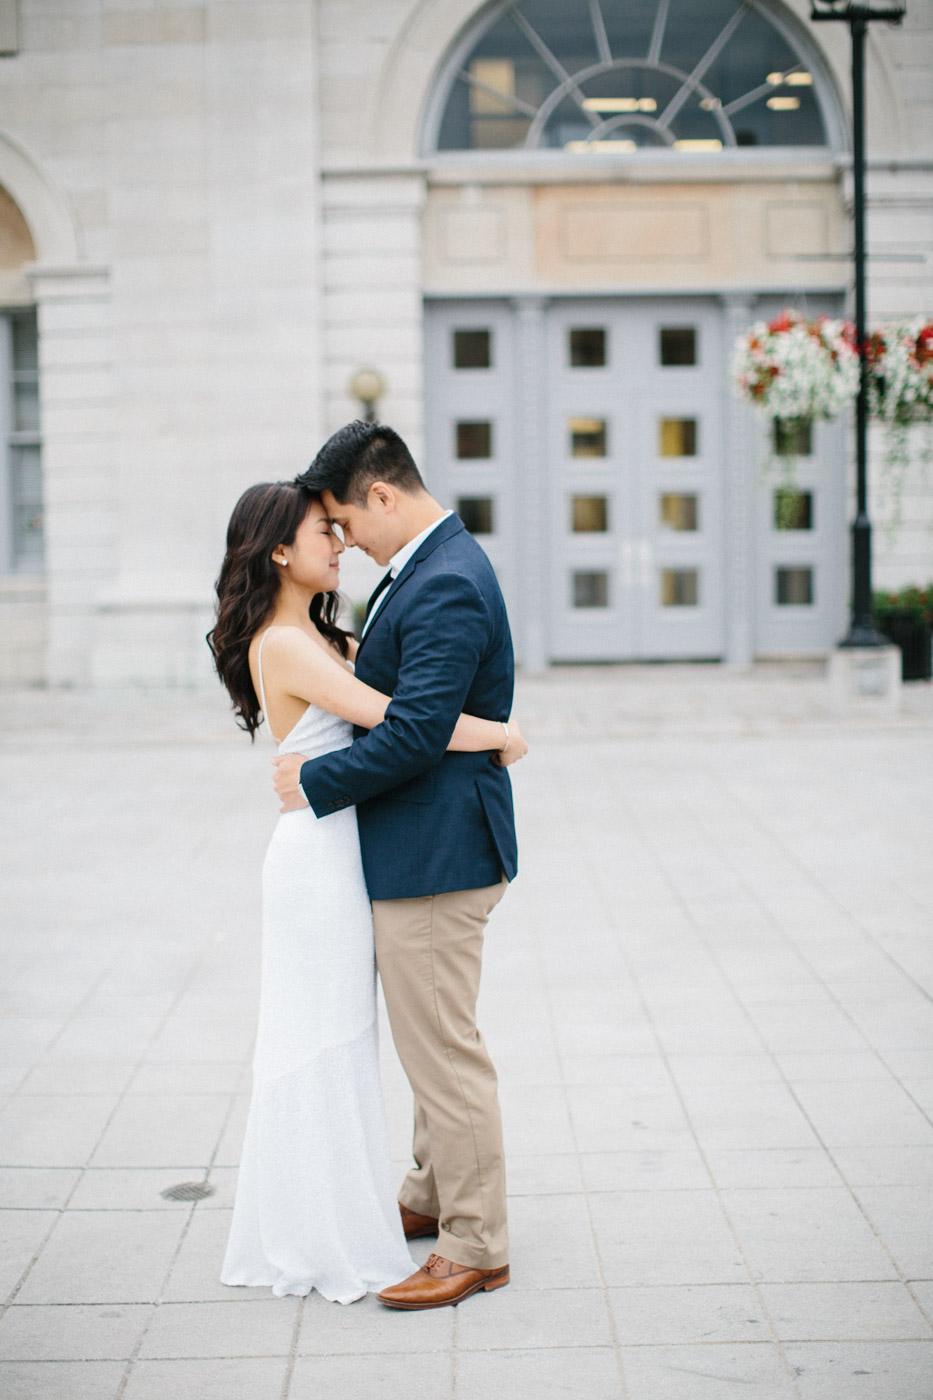 toronto_wedding_photographer_fine_art_documentary 2017-98.jpg